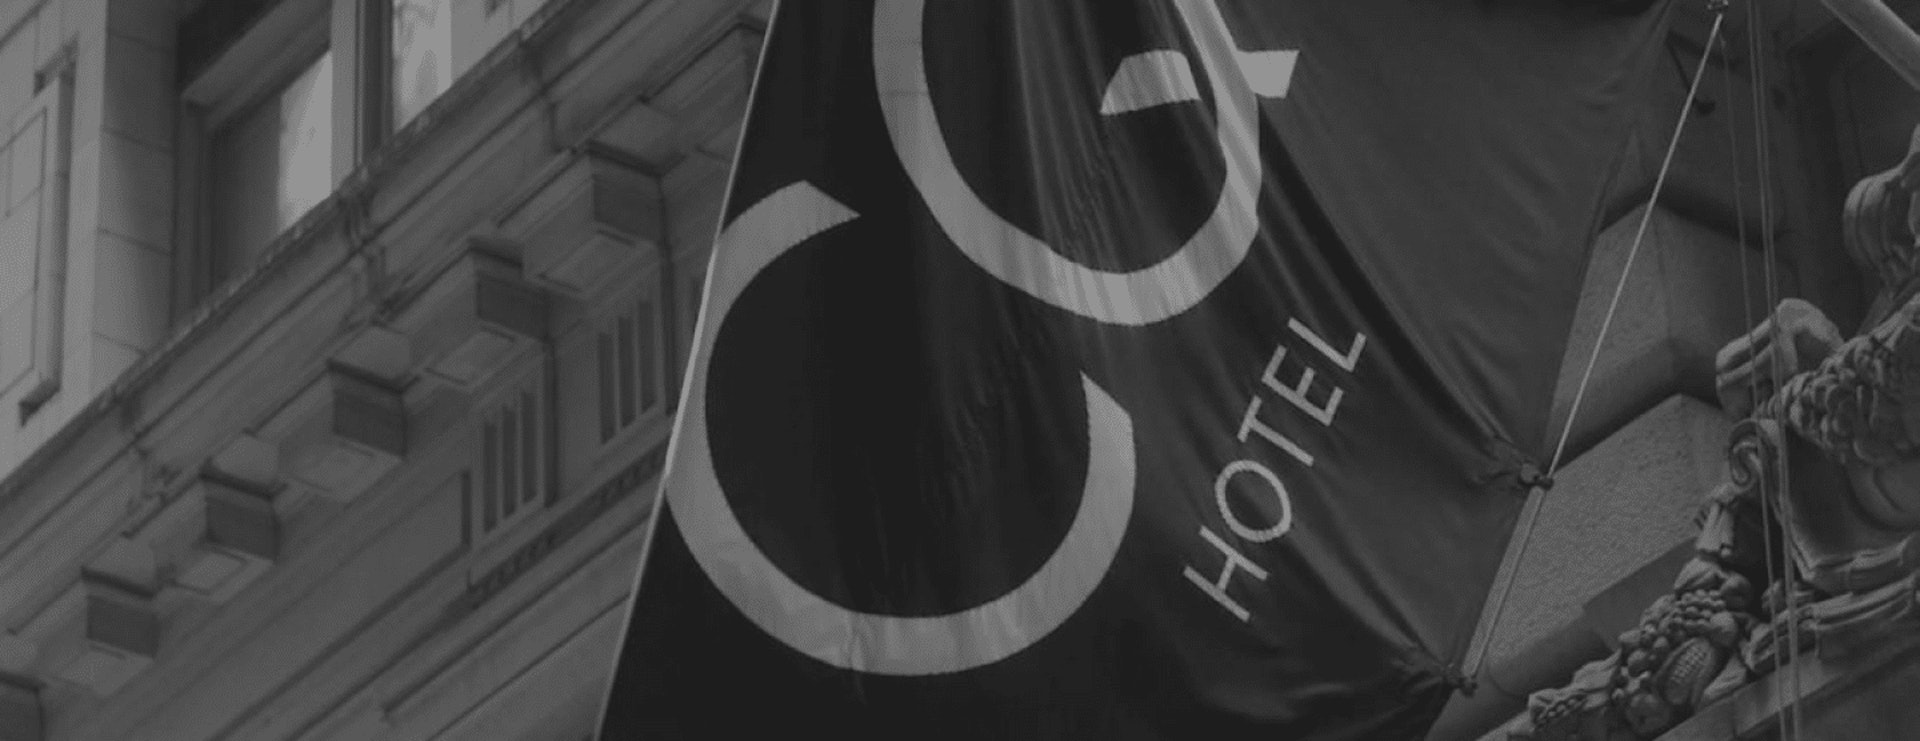 CQ Hotel Flag